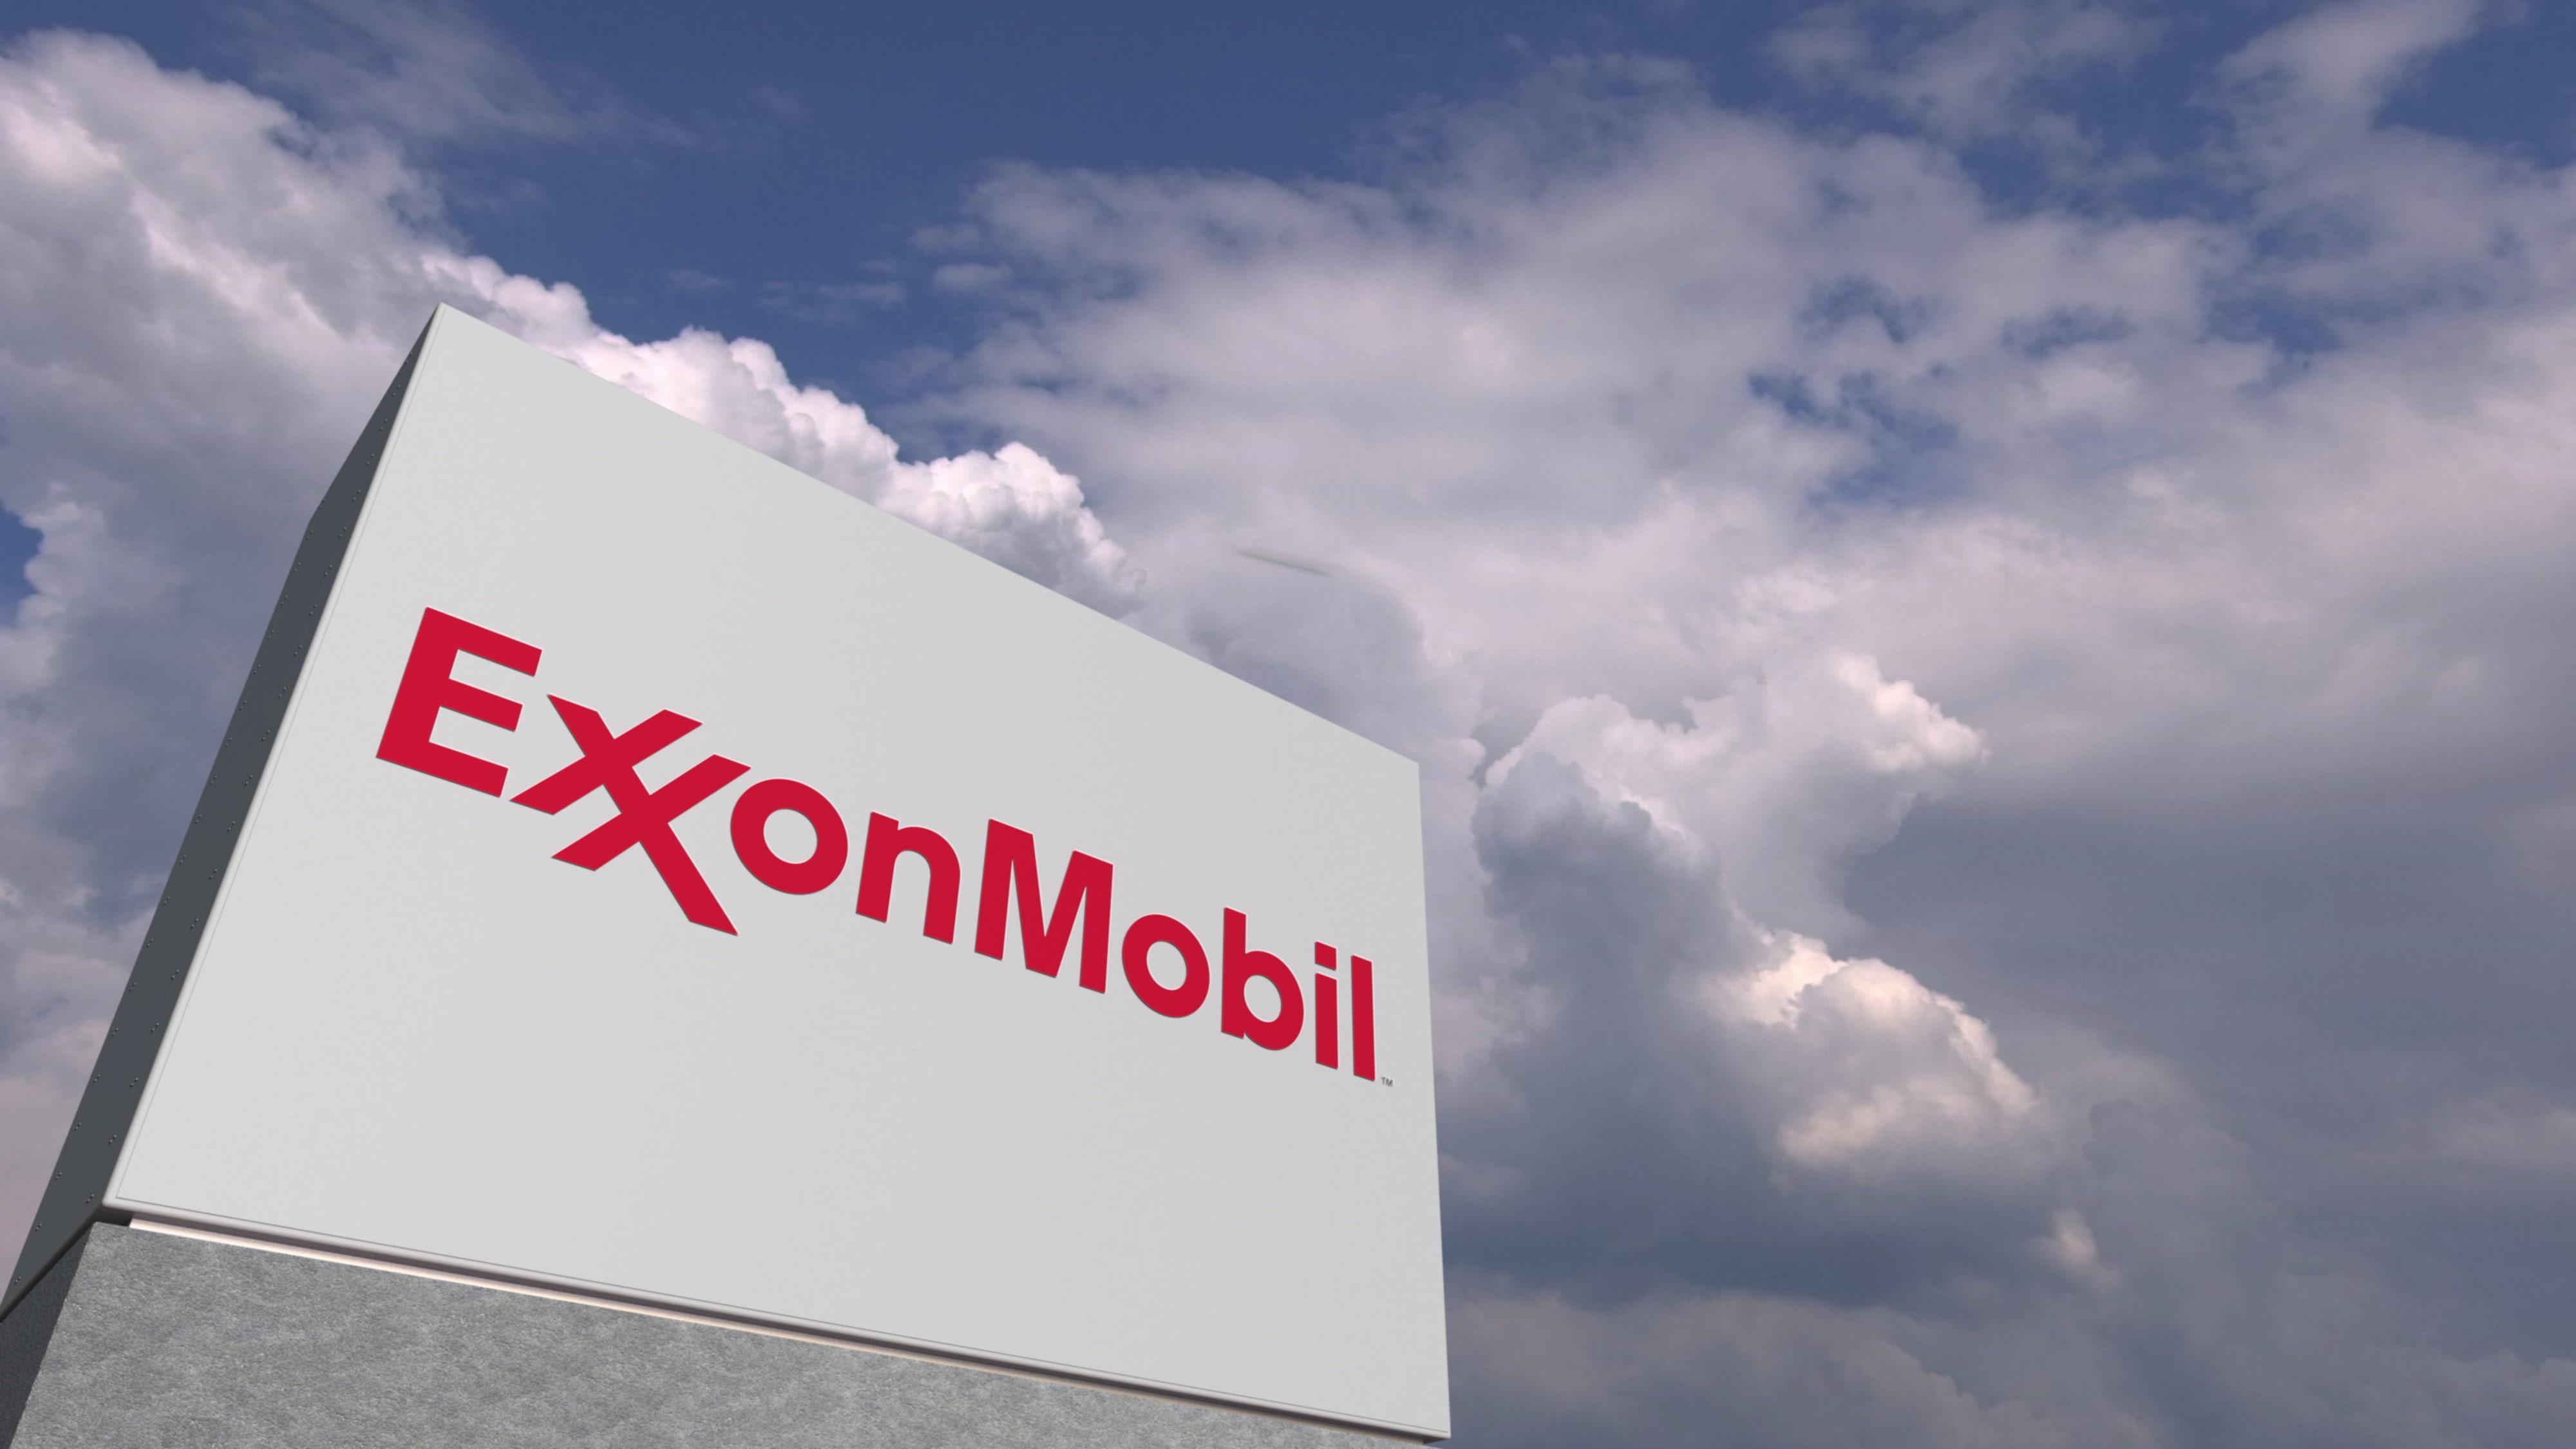 How ExxonMobil Makes money